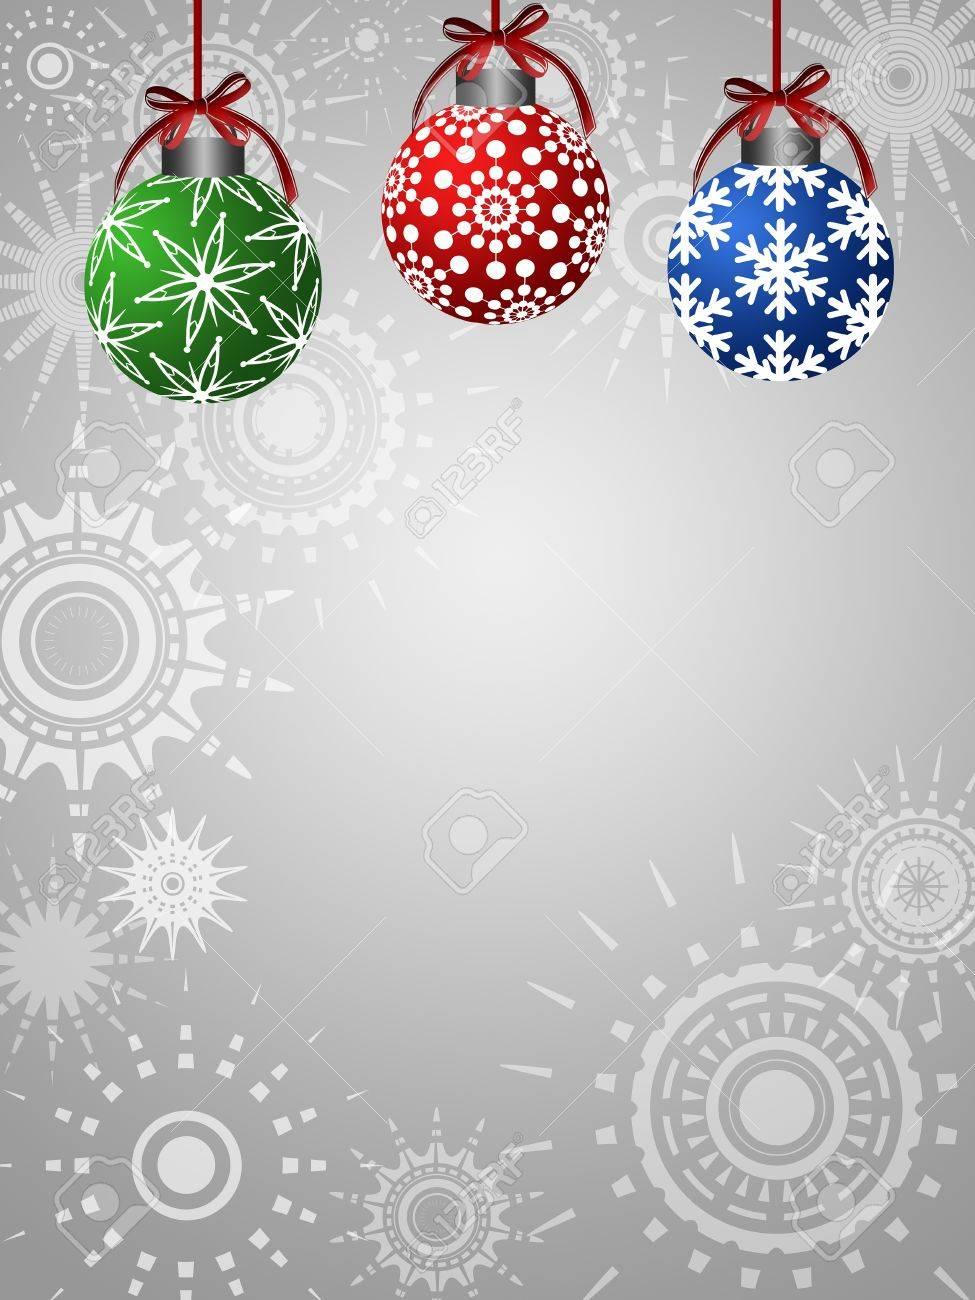 Three Colorful Ornaments on Silver Sun Star Background Illustration Stock Illustration - 11134105